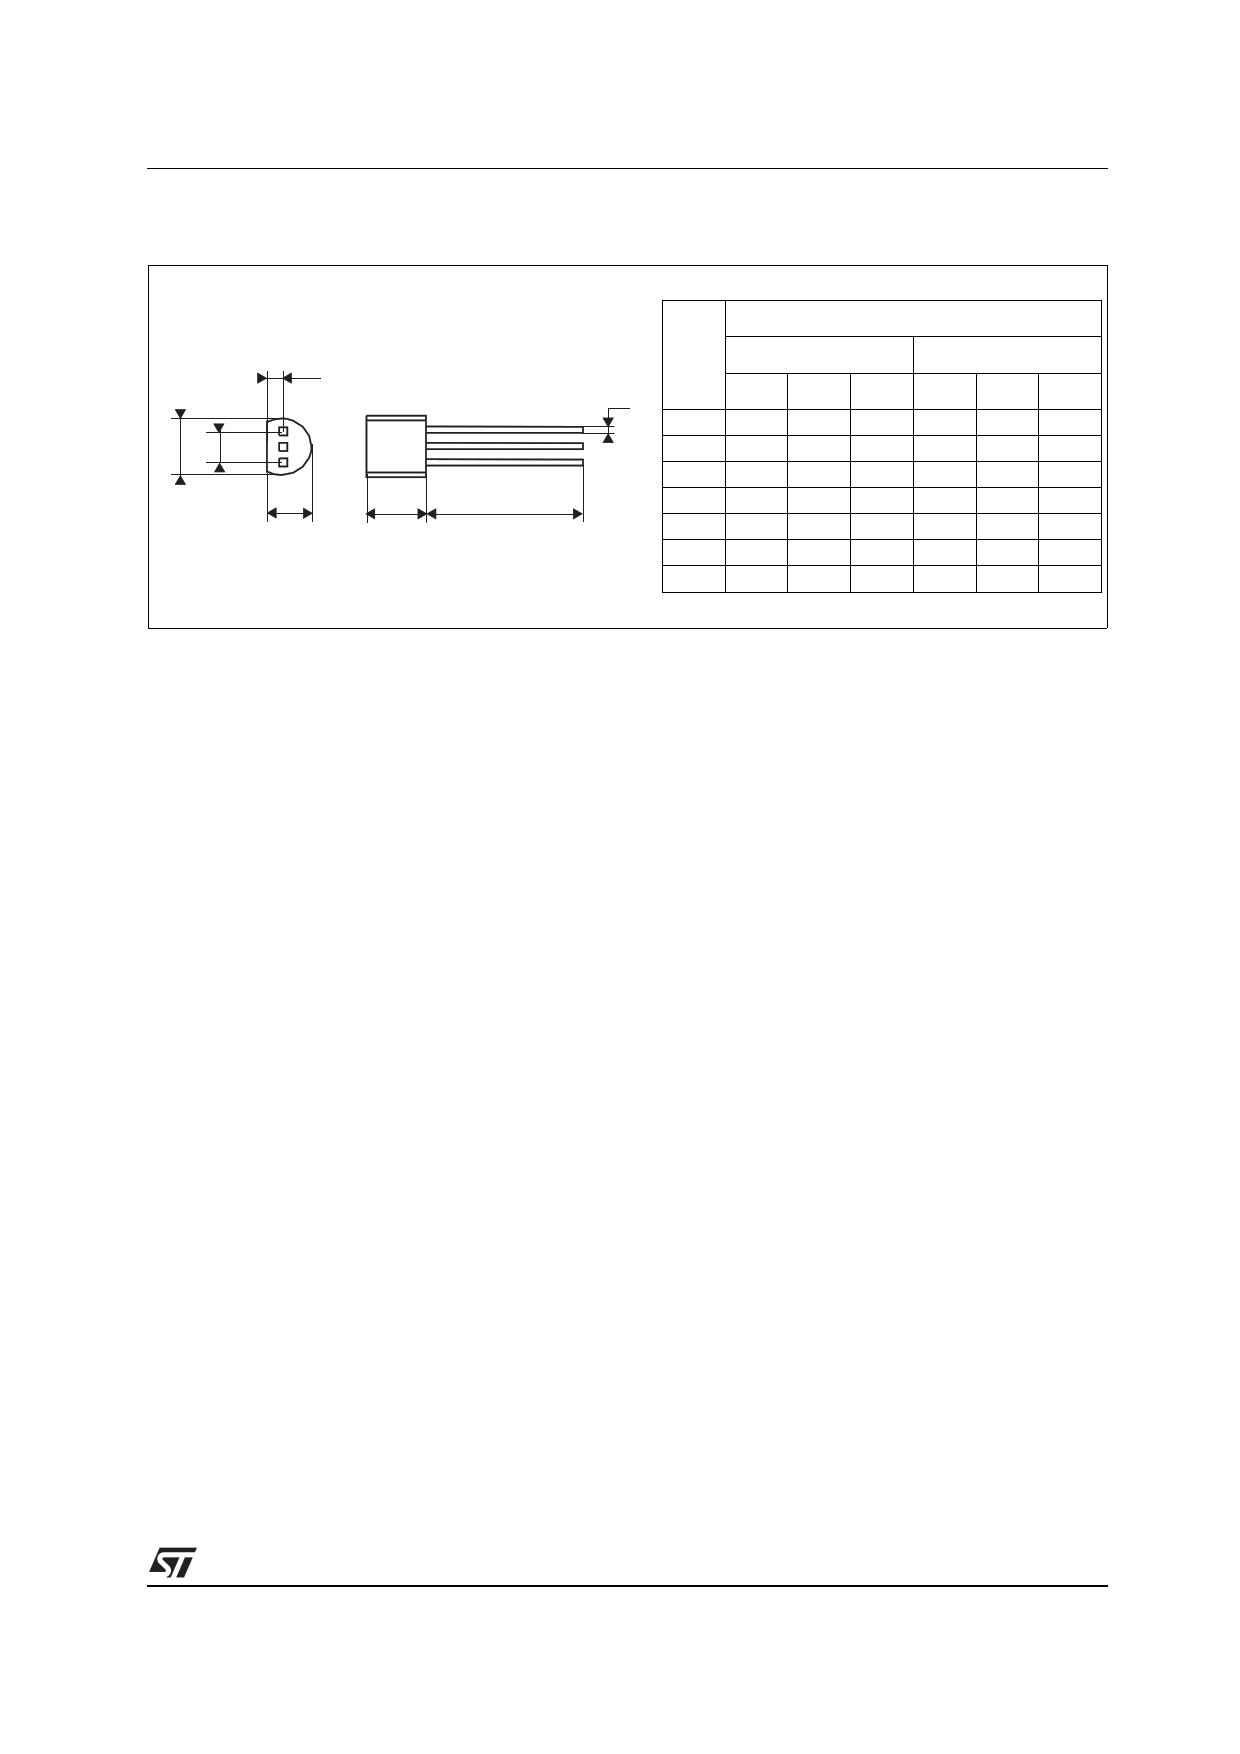 X00602MA5AL2 pdf, arduino